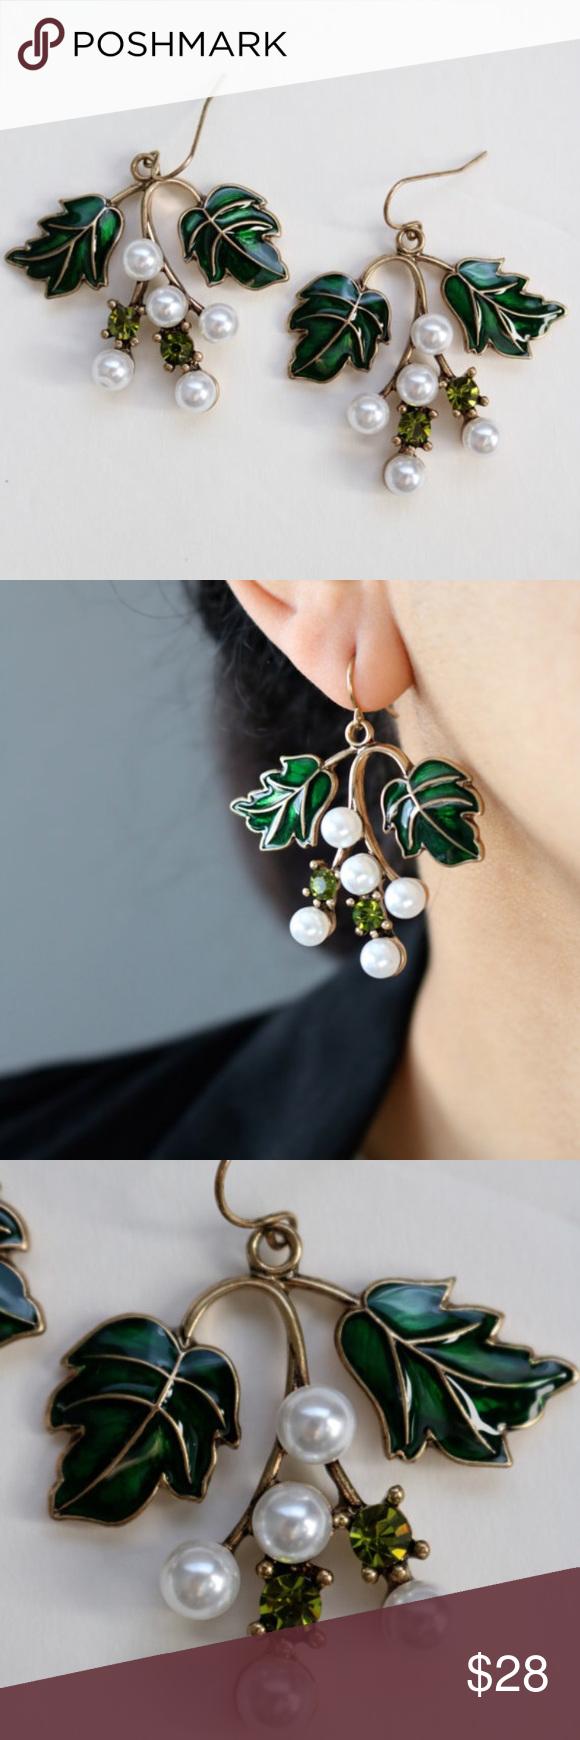 "Antique gold Green Leaf Drop Earrings. Green Leaf Drop Earrings.  Lenght: 1.8"" X 1.6"" Jewelry Earrings"